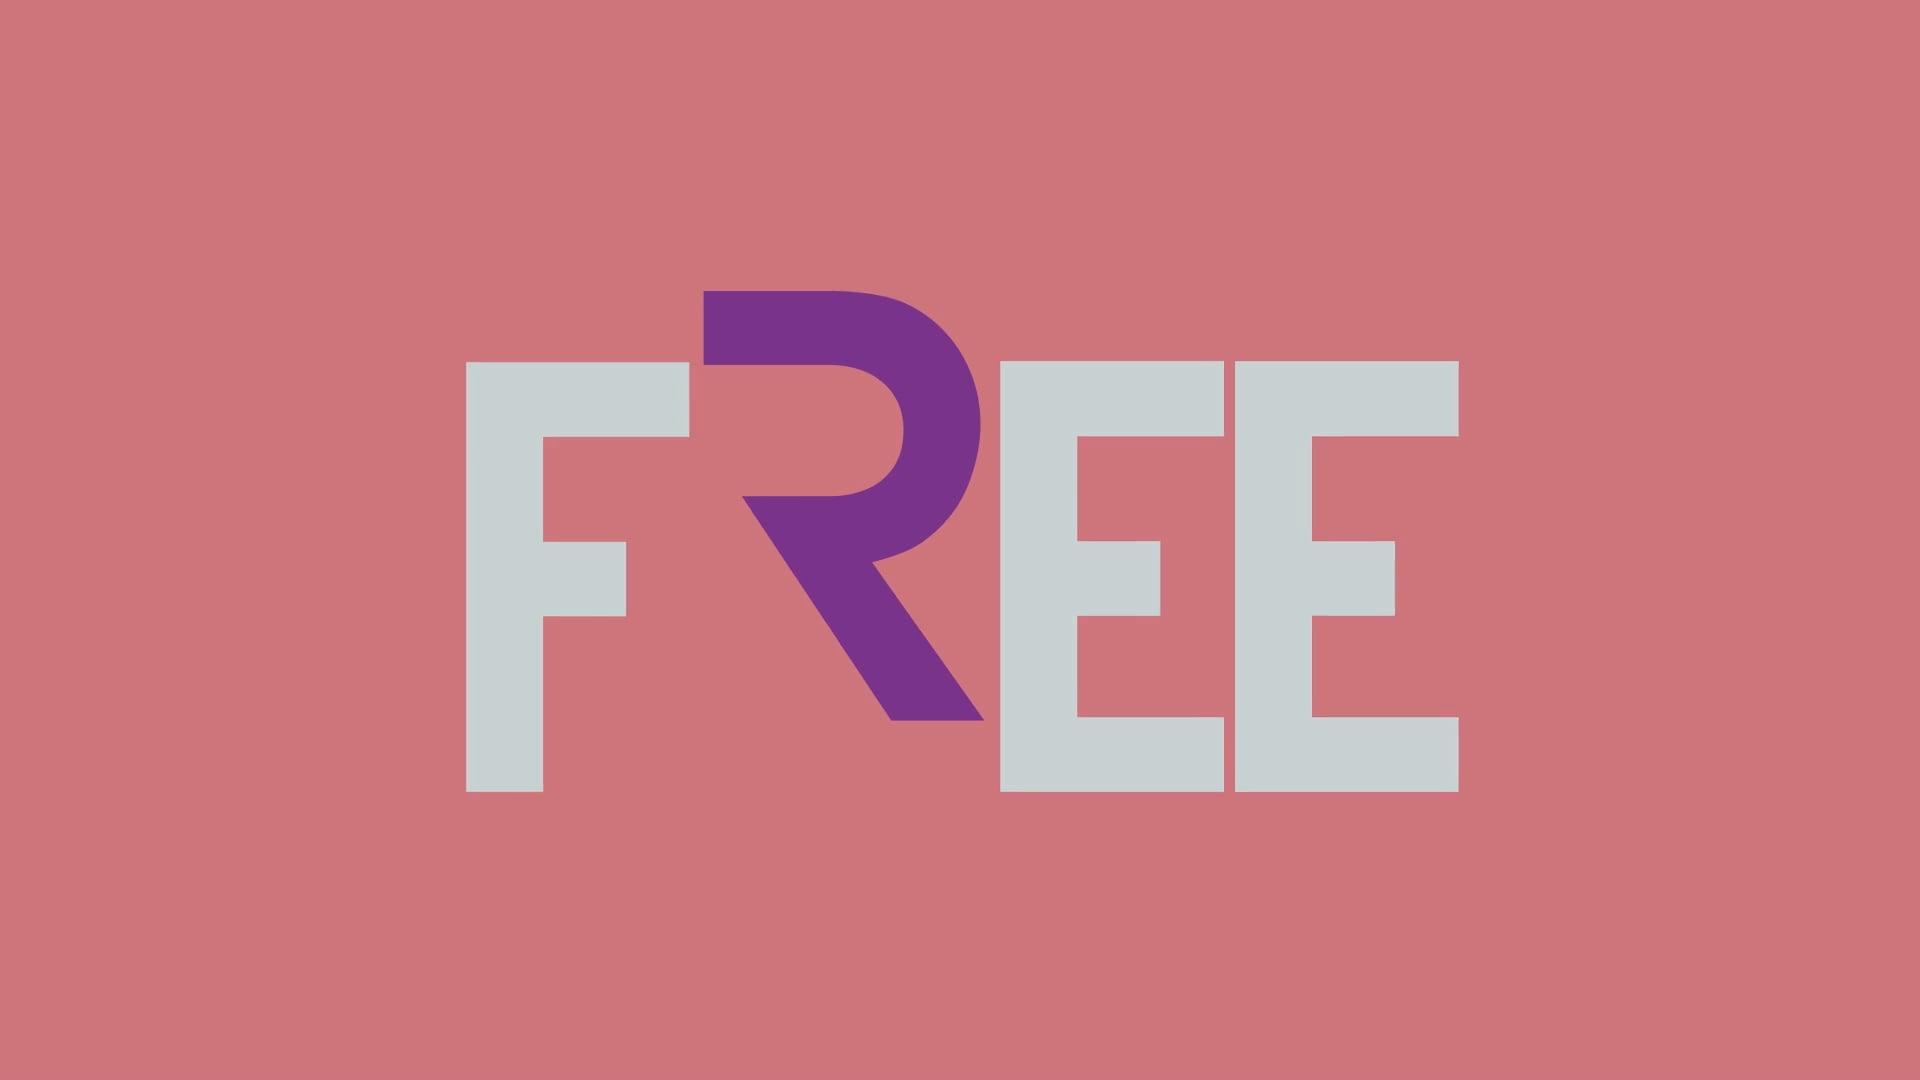 FREE Teaser